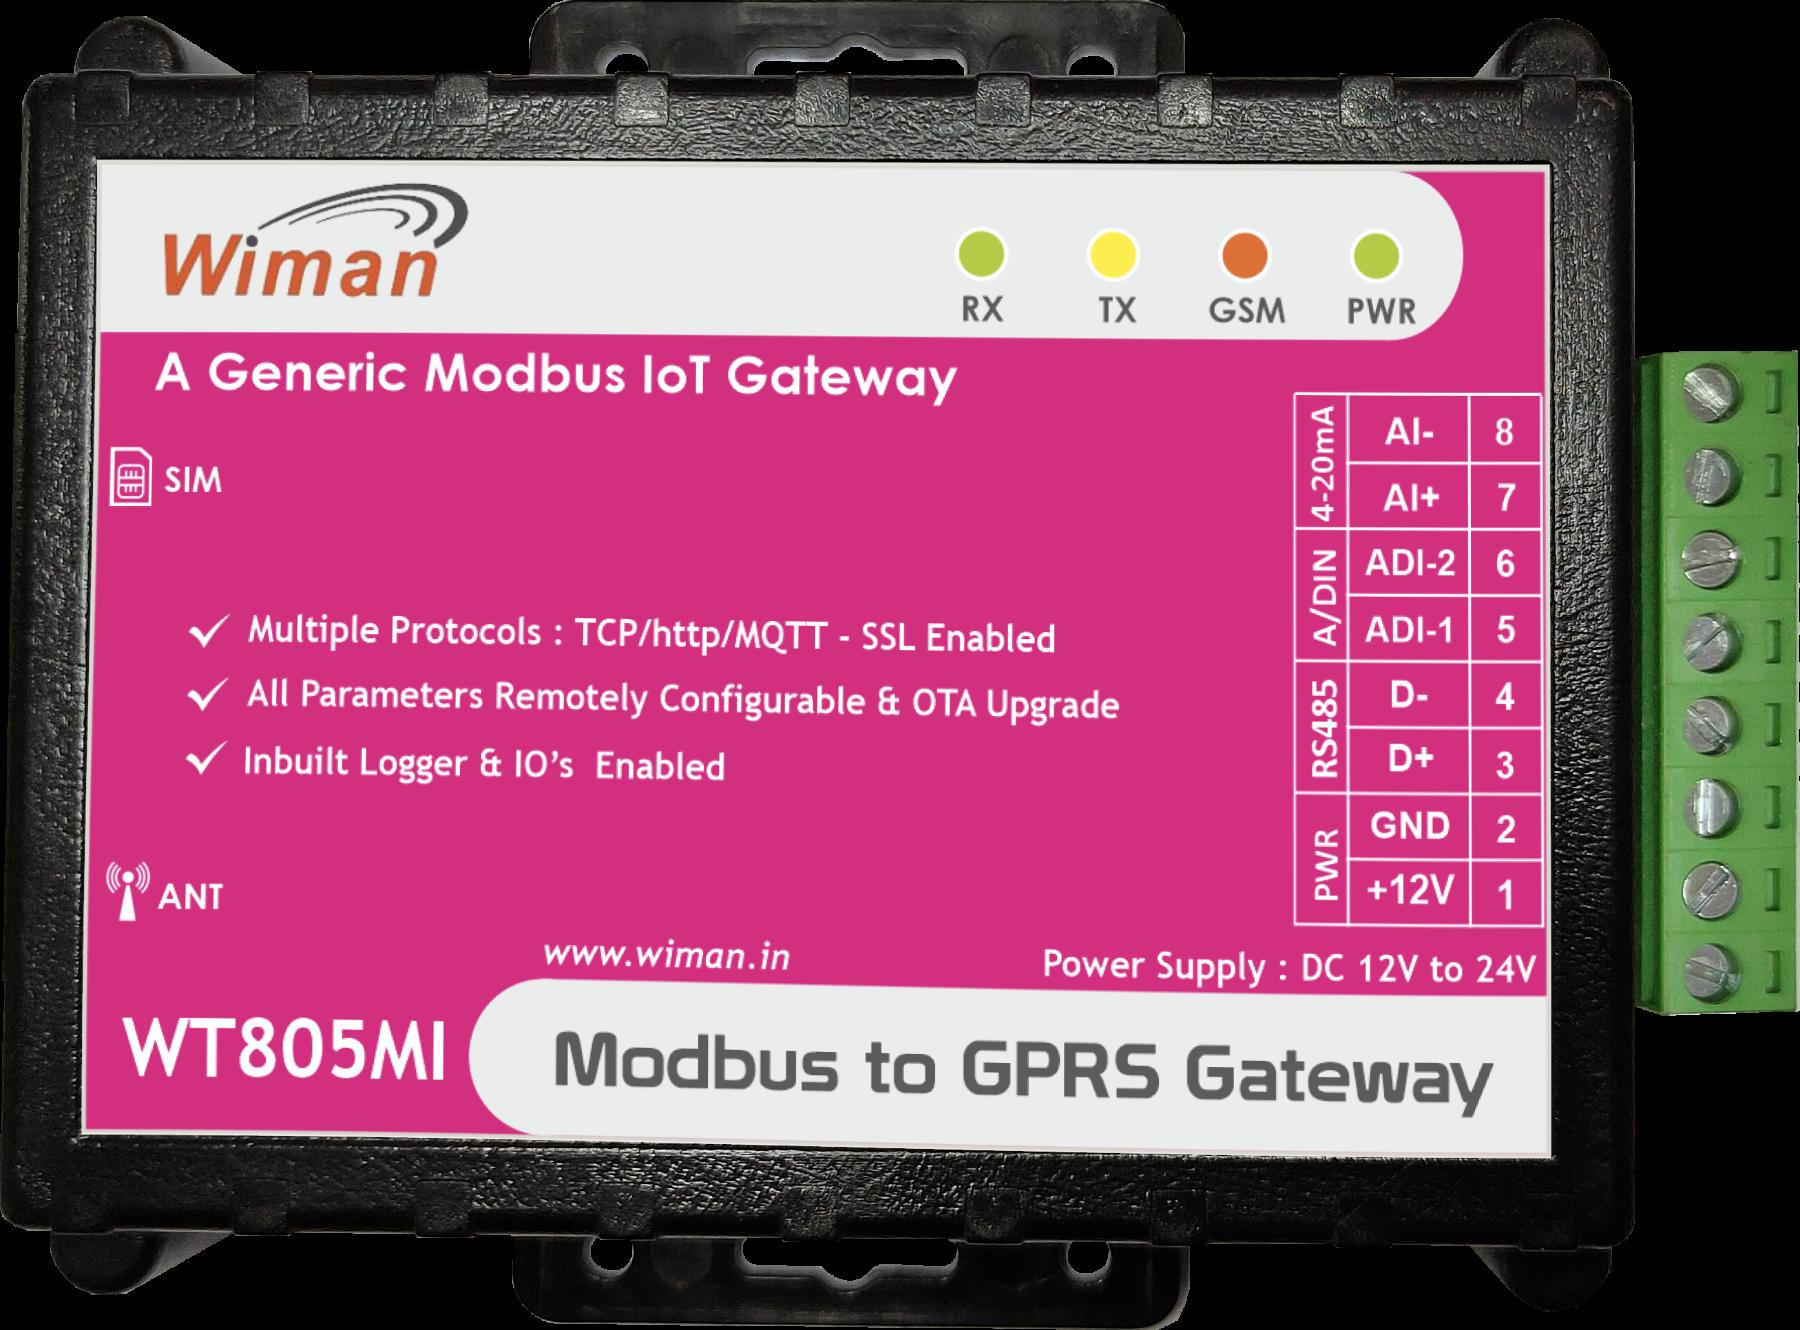 gprs gateway